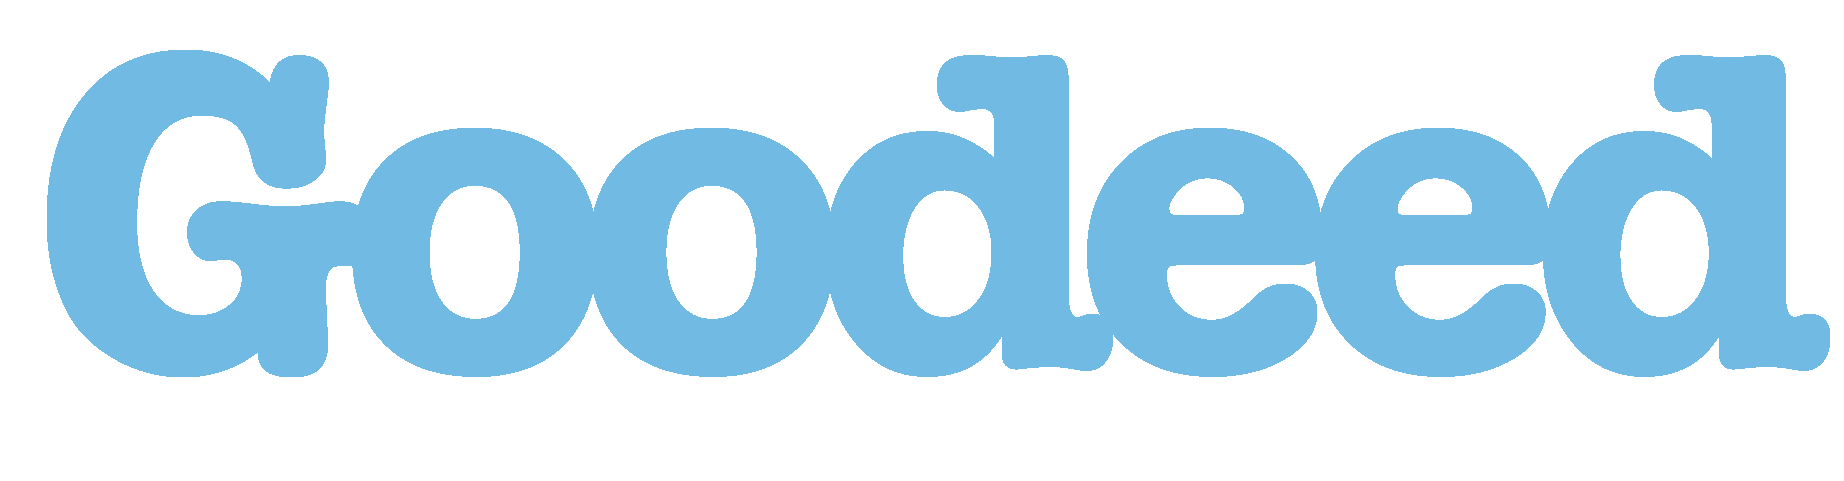 Goodeed logo